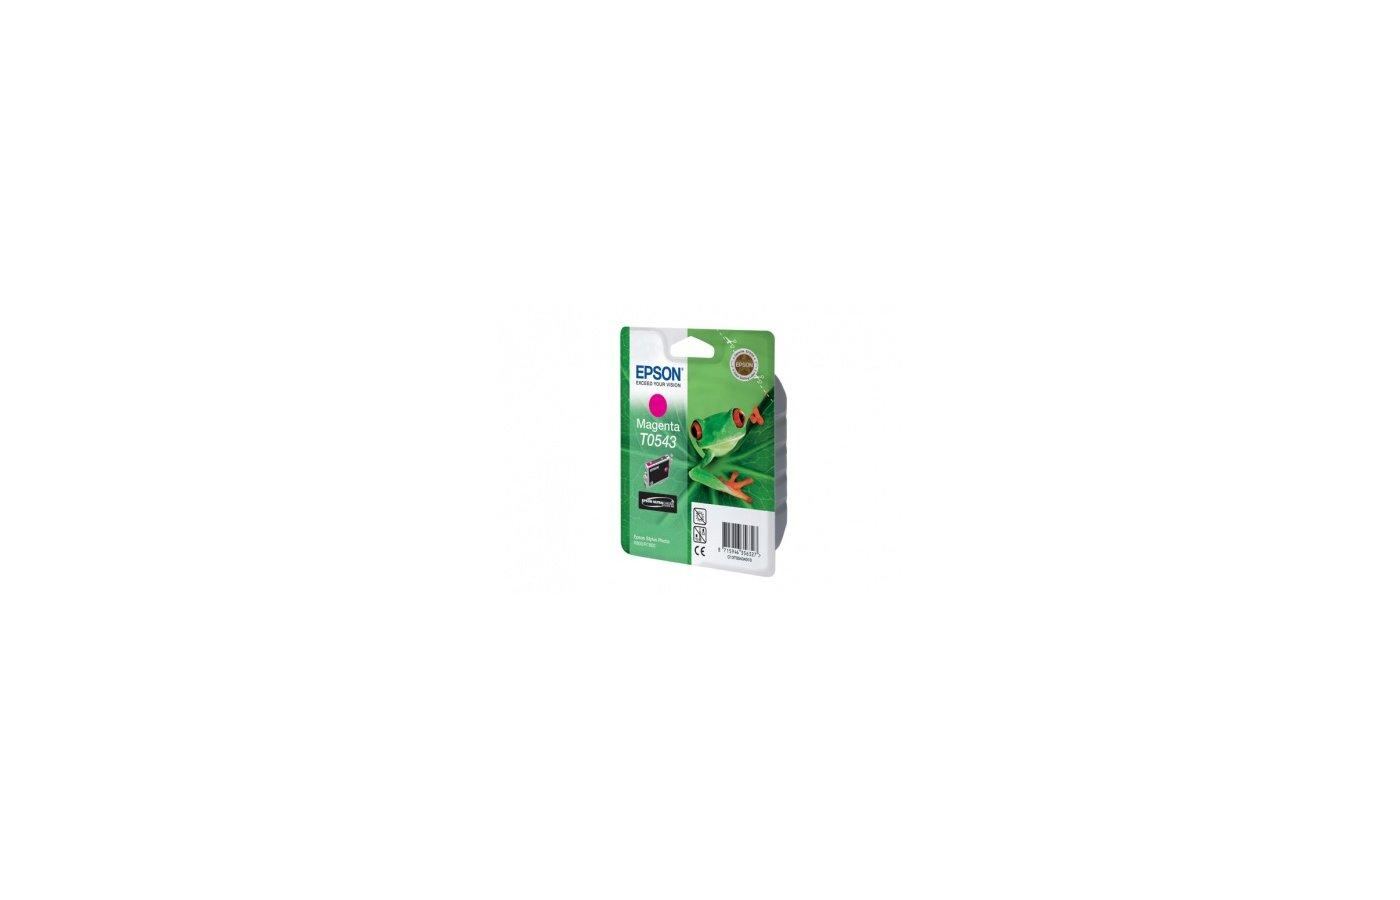 Картридж струйный Epson C13T054340 пурпурный для Stylus Photo R800